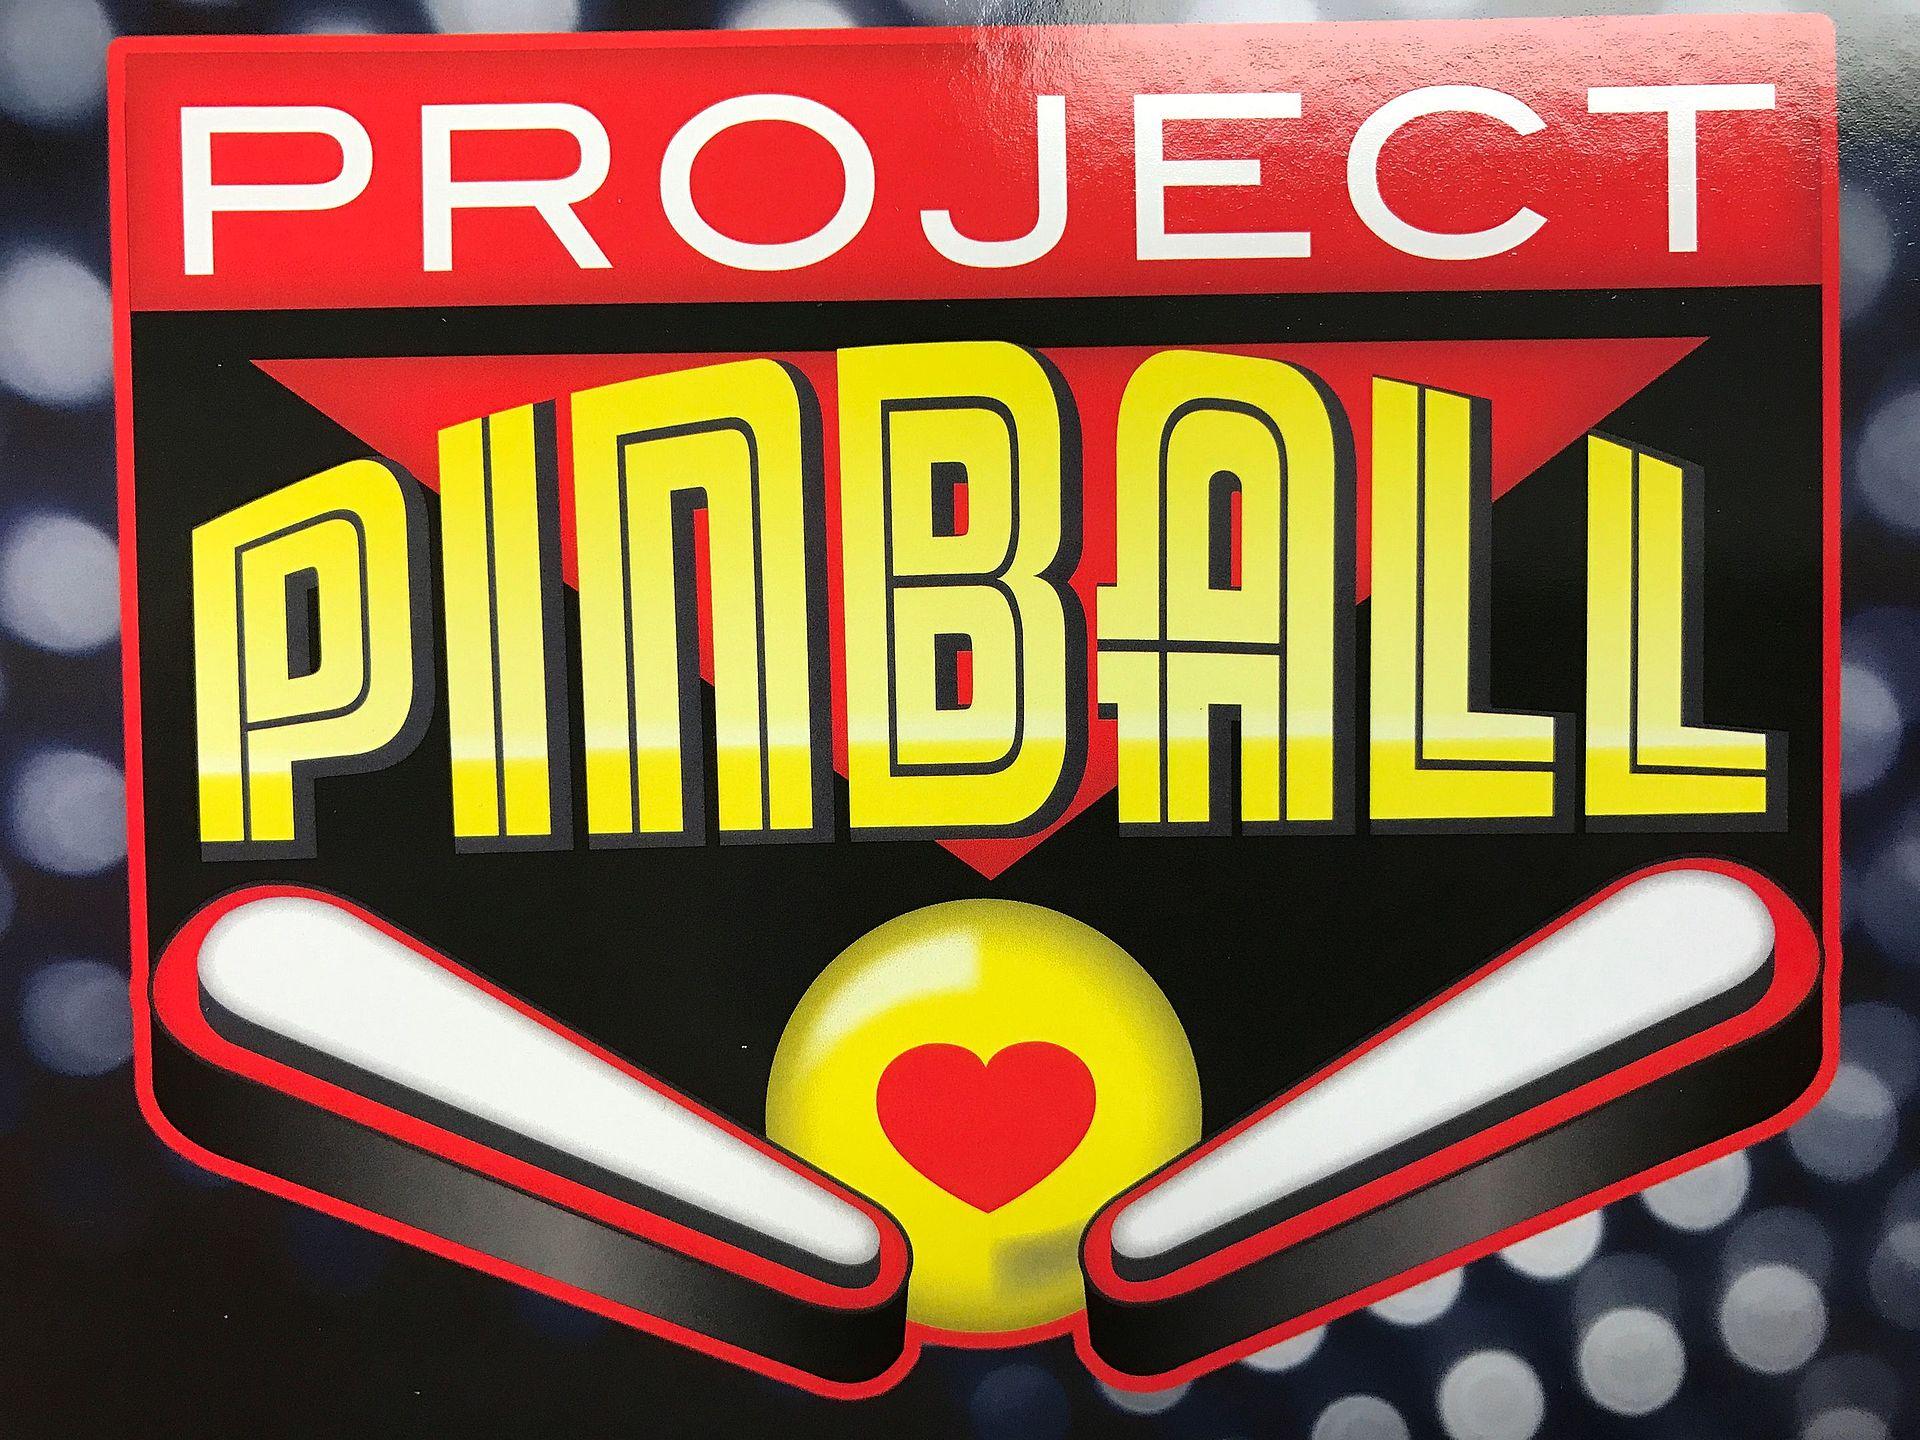 Project pinball logo